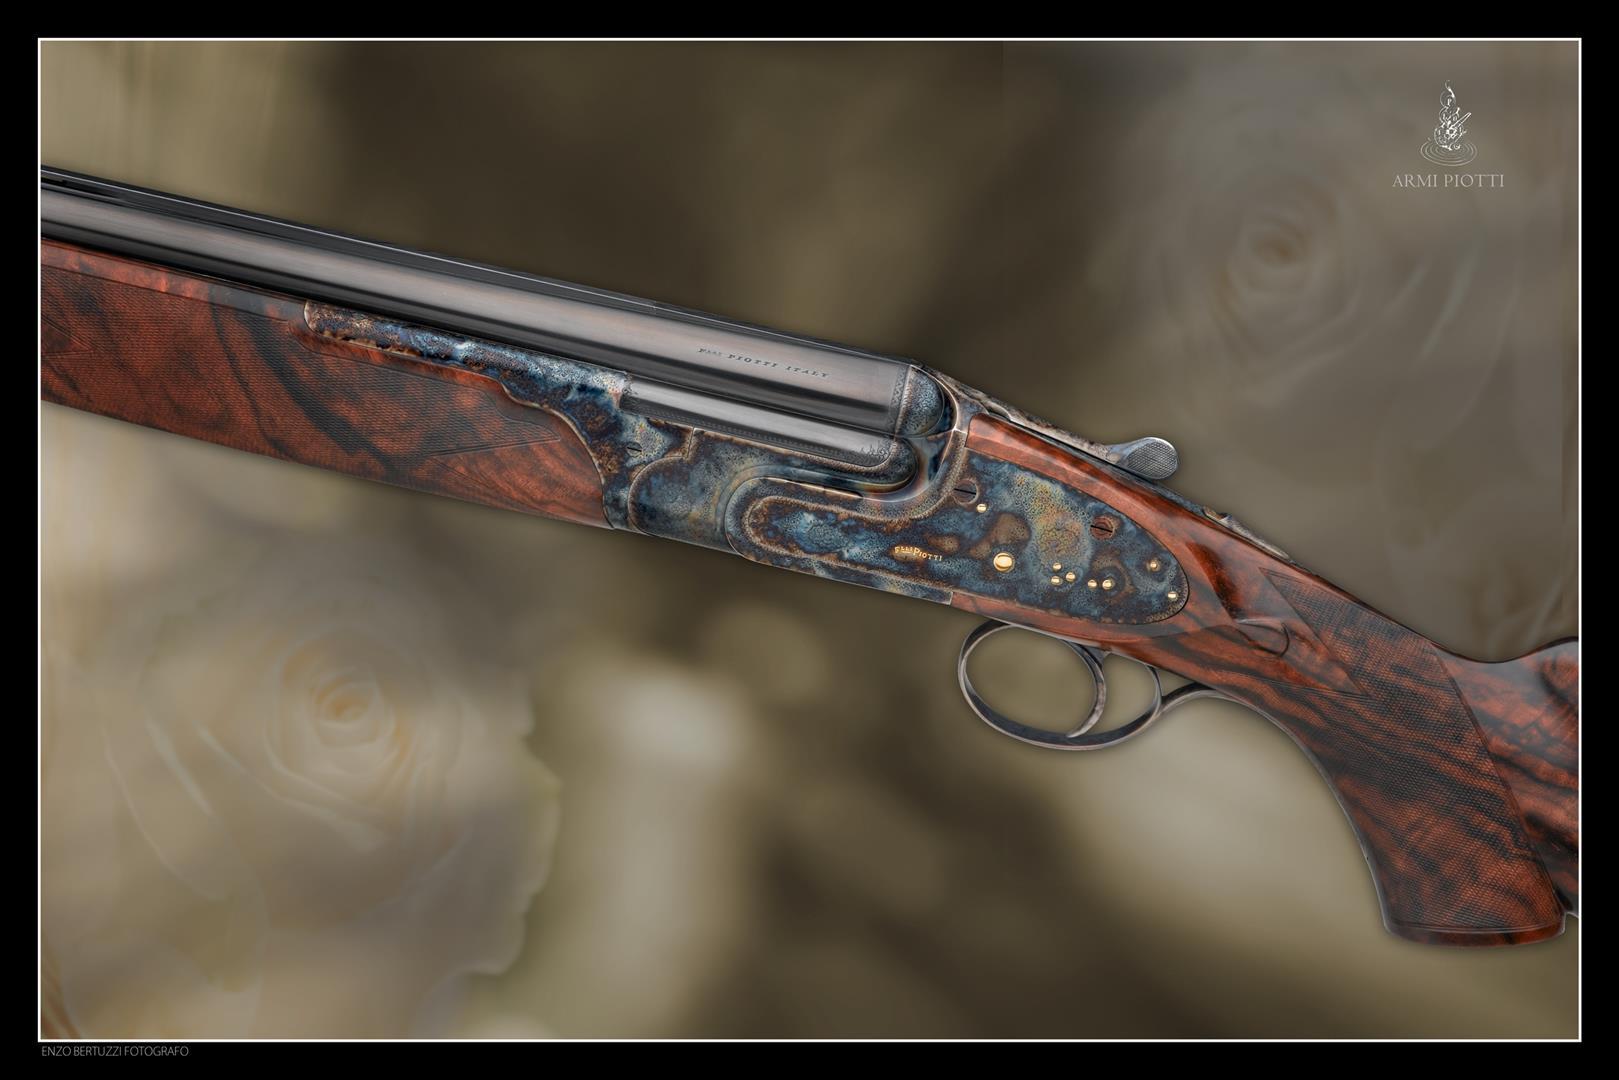 Piotti Boss shotgun